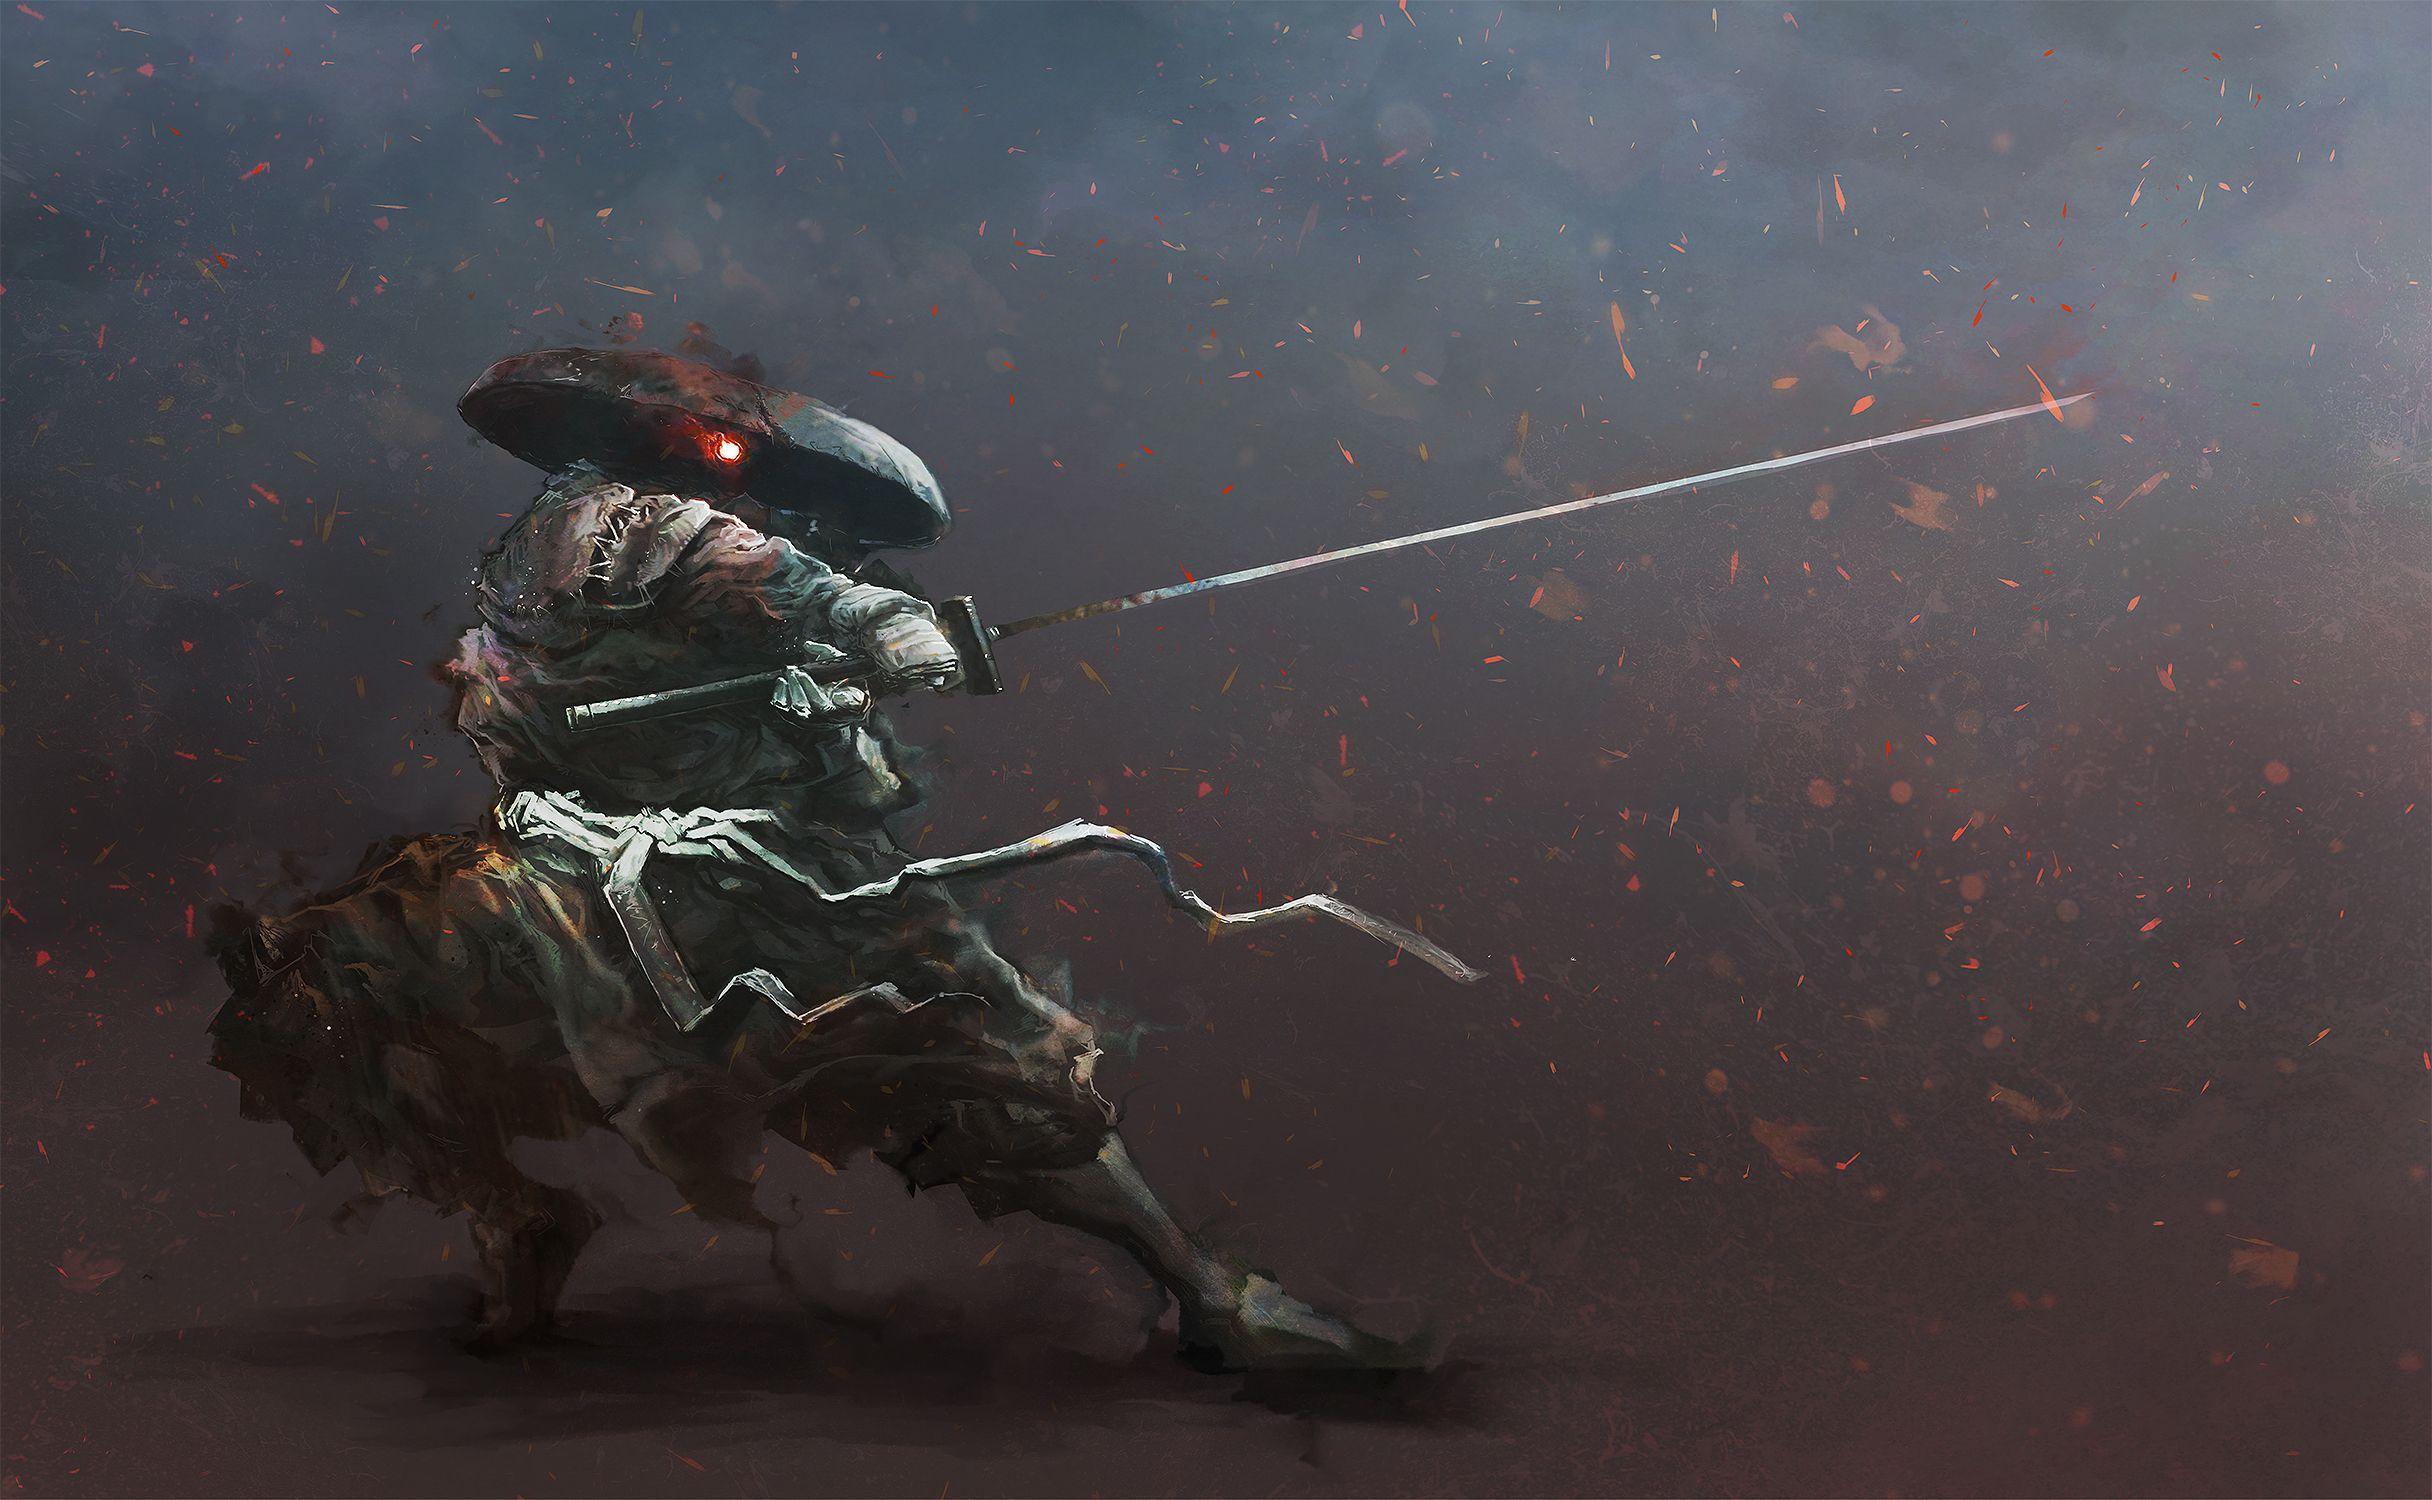 Ronin Samurai Wallpapers Top Free Ronin Samurai Backgrounds